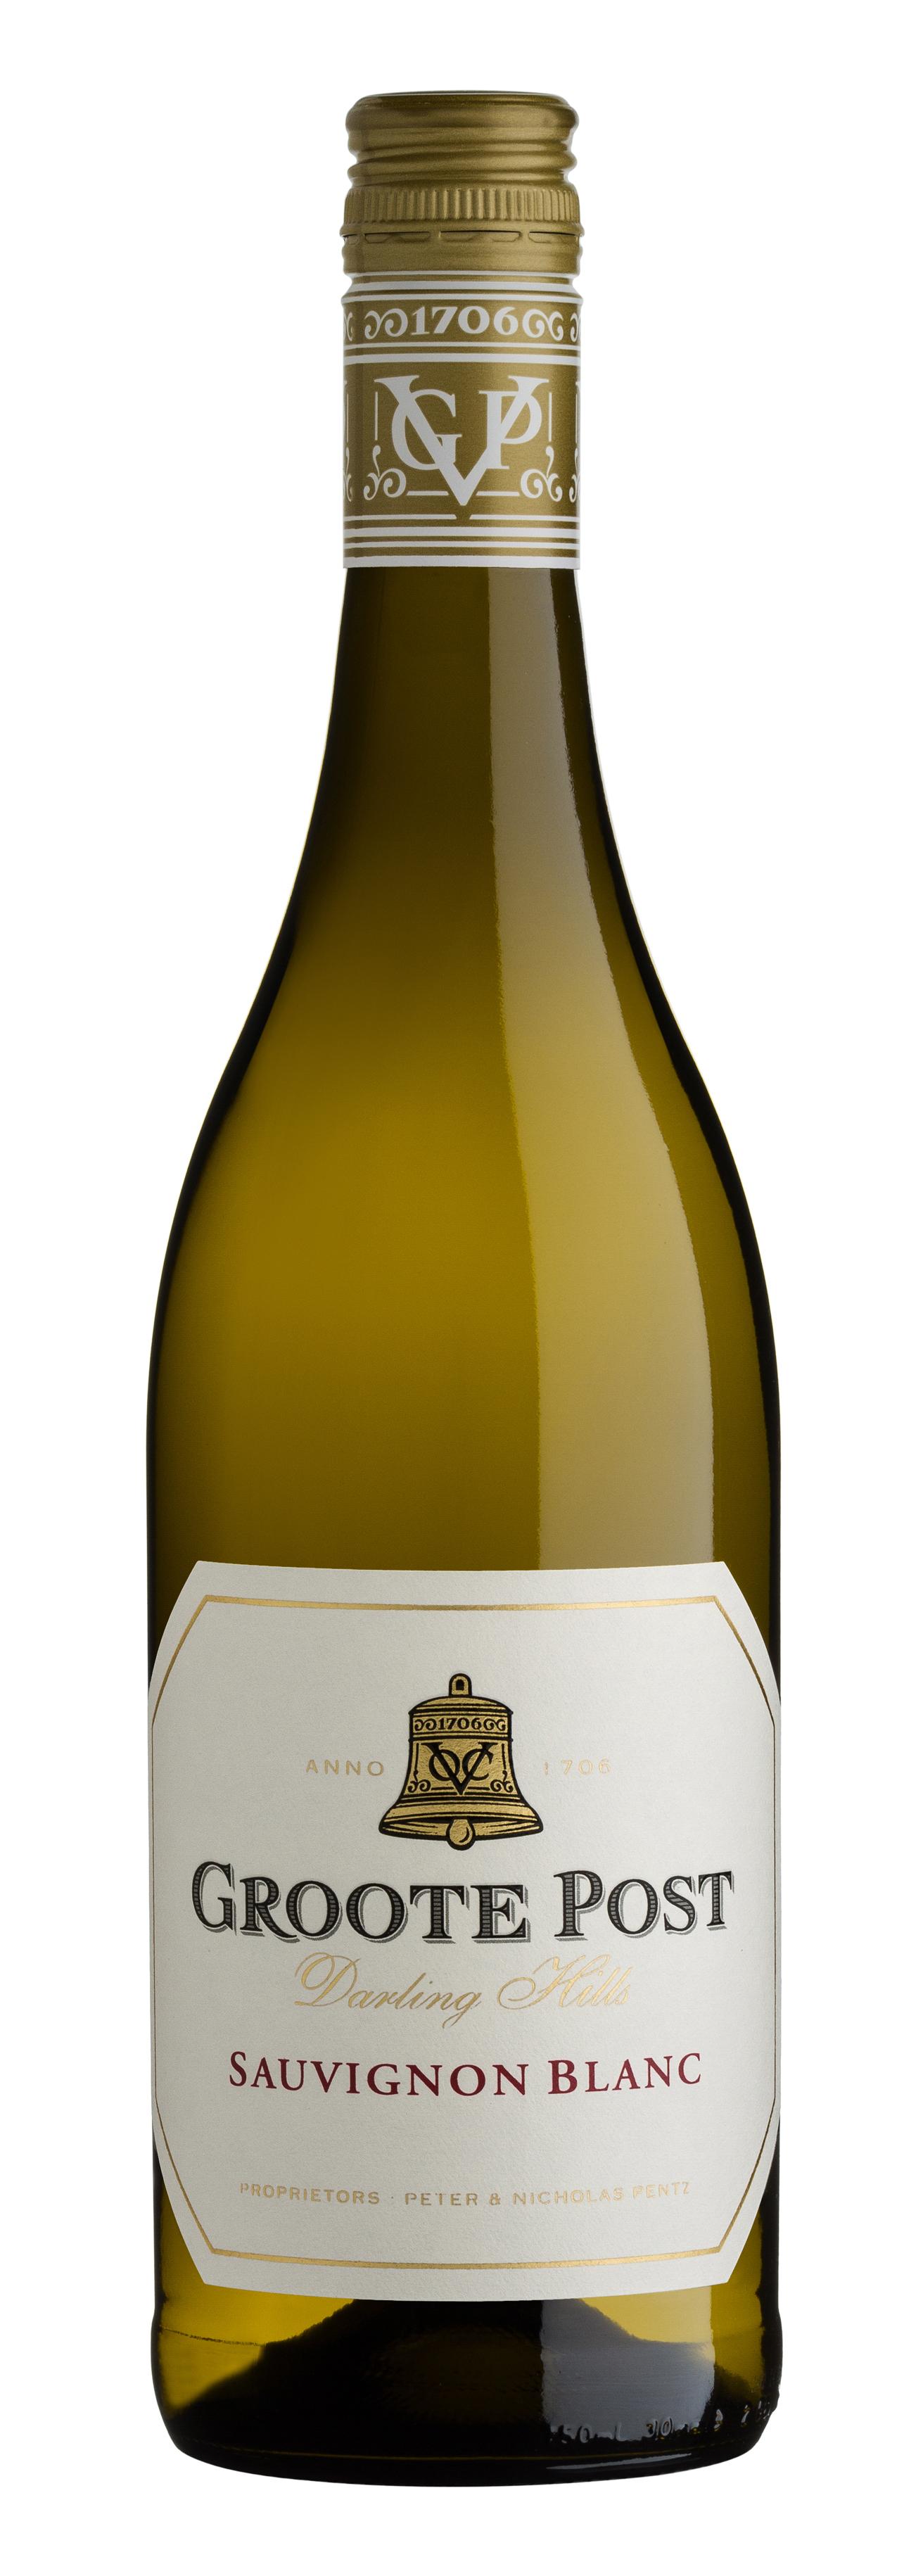 Groote Post Sauvignon Blanc